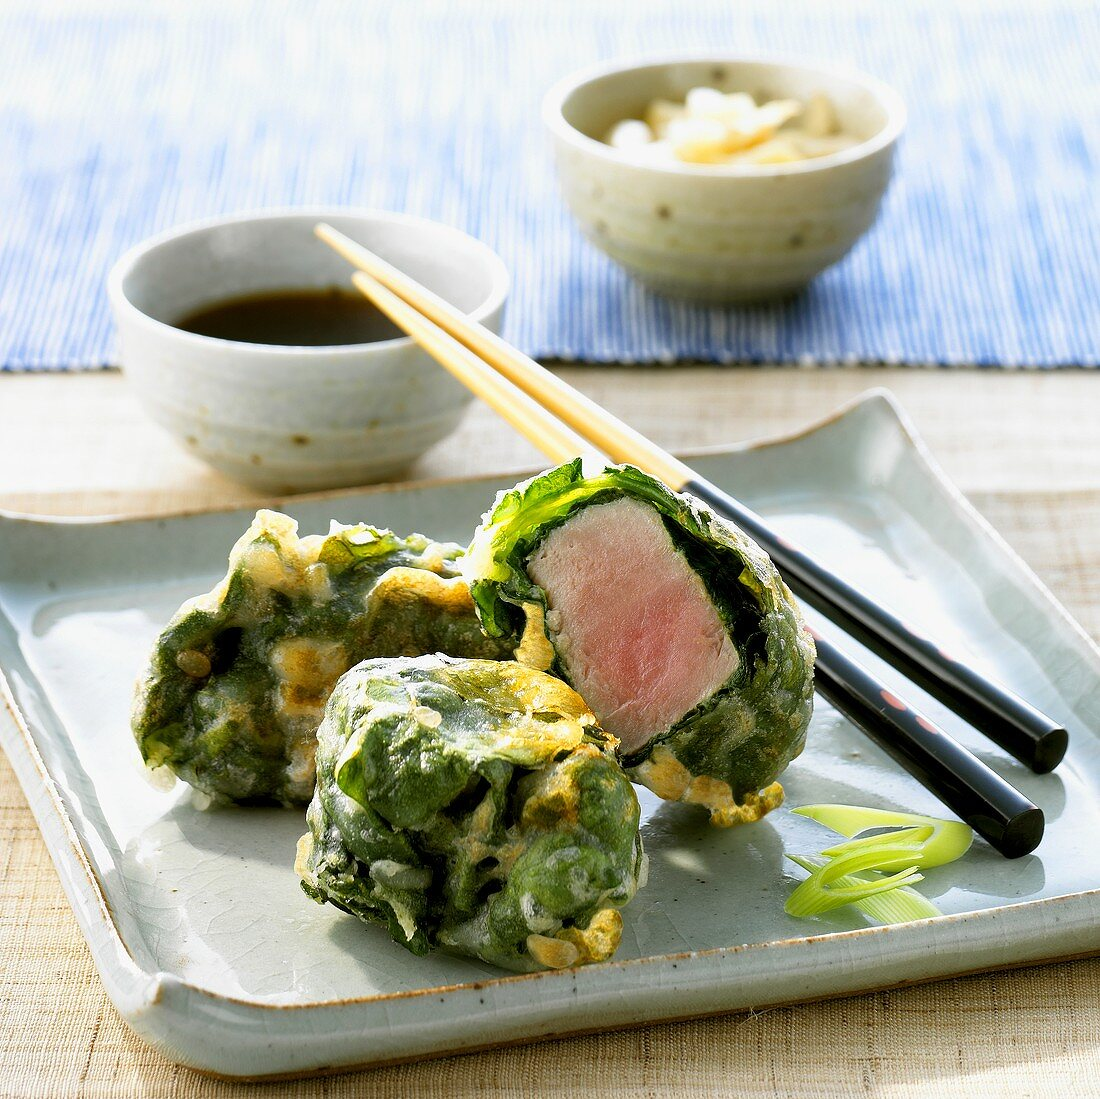 Tuna in tempura batter with soy sauce (Japan)